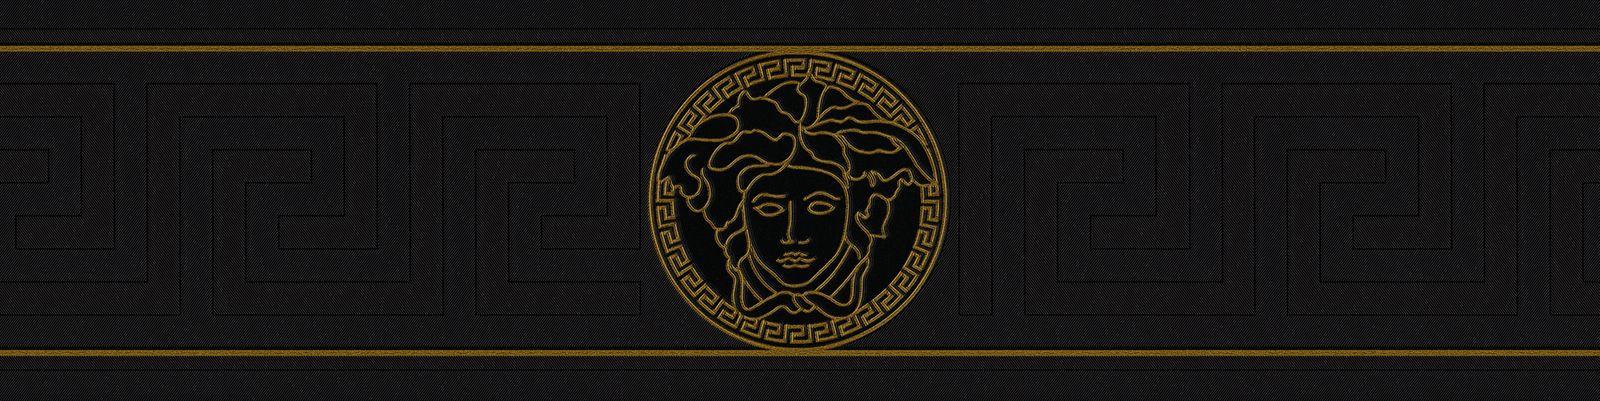 Versace wallpaper krb-pec